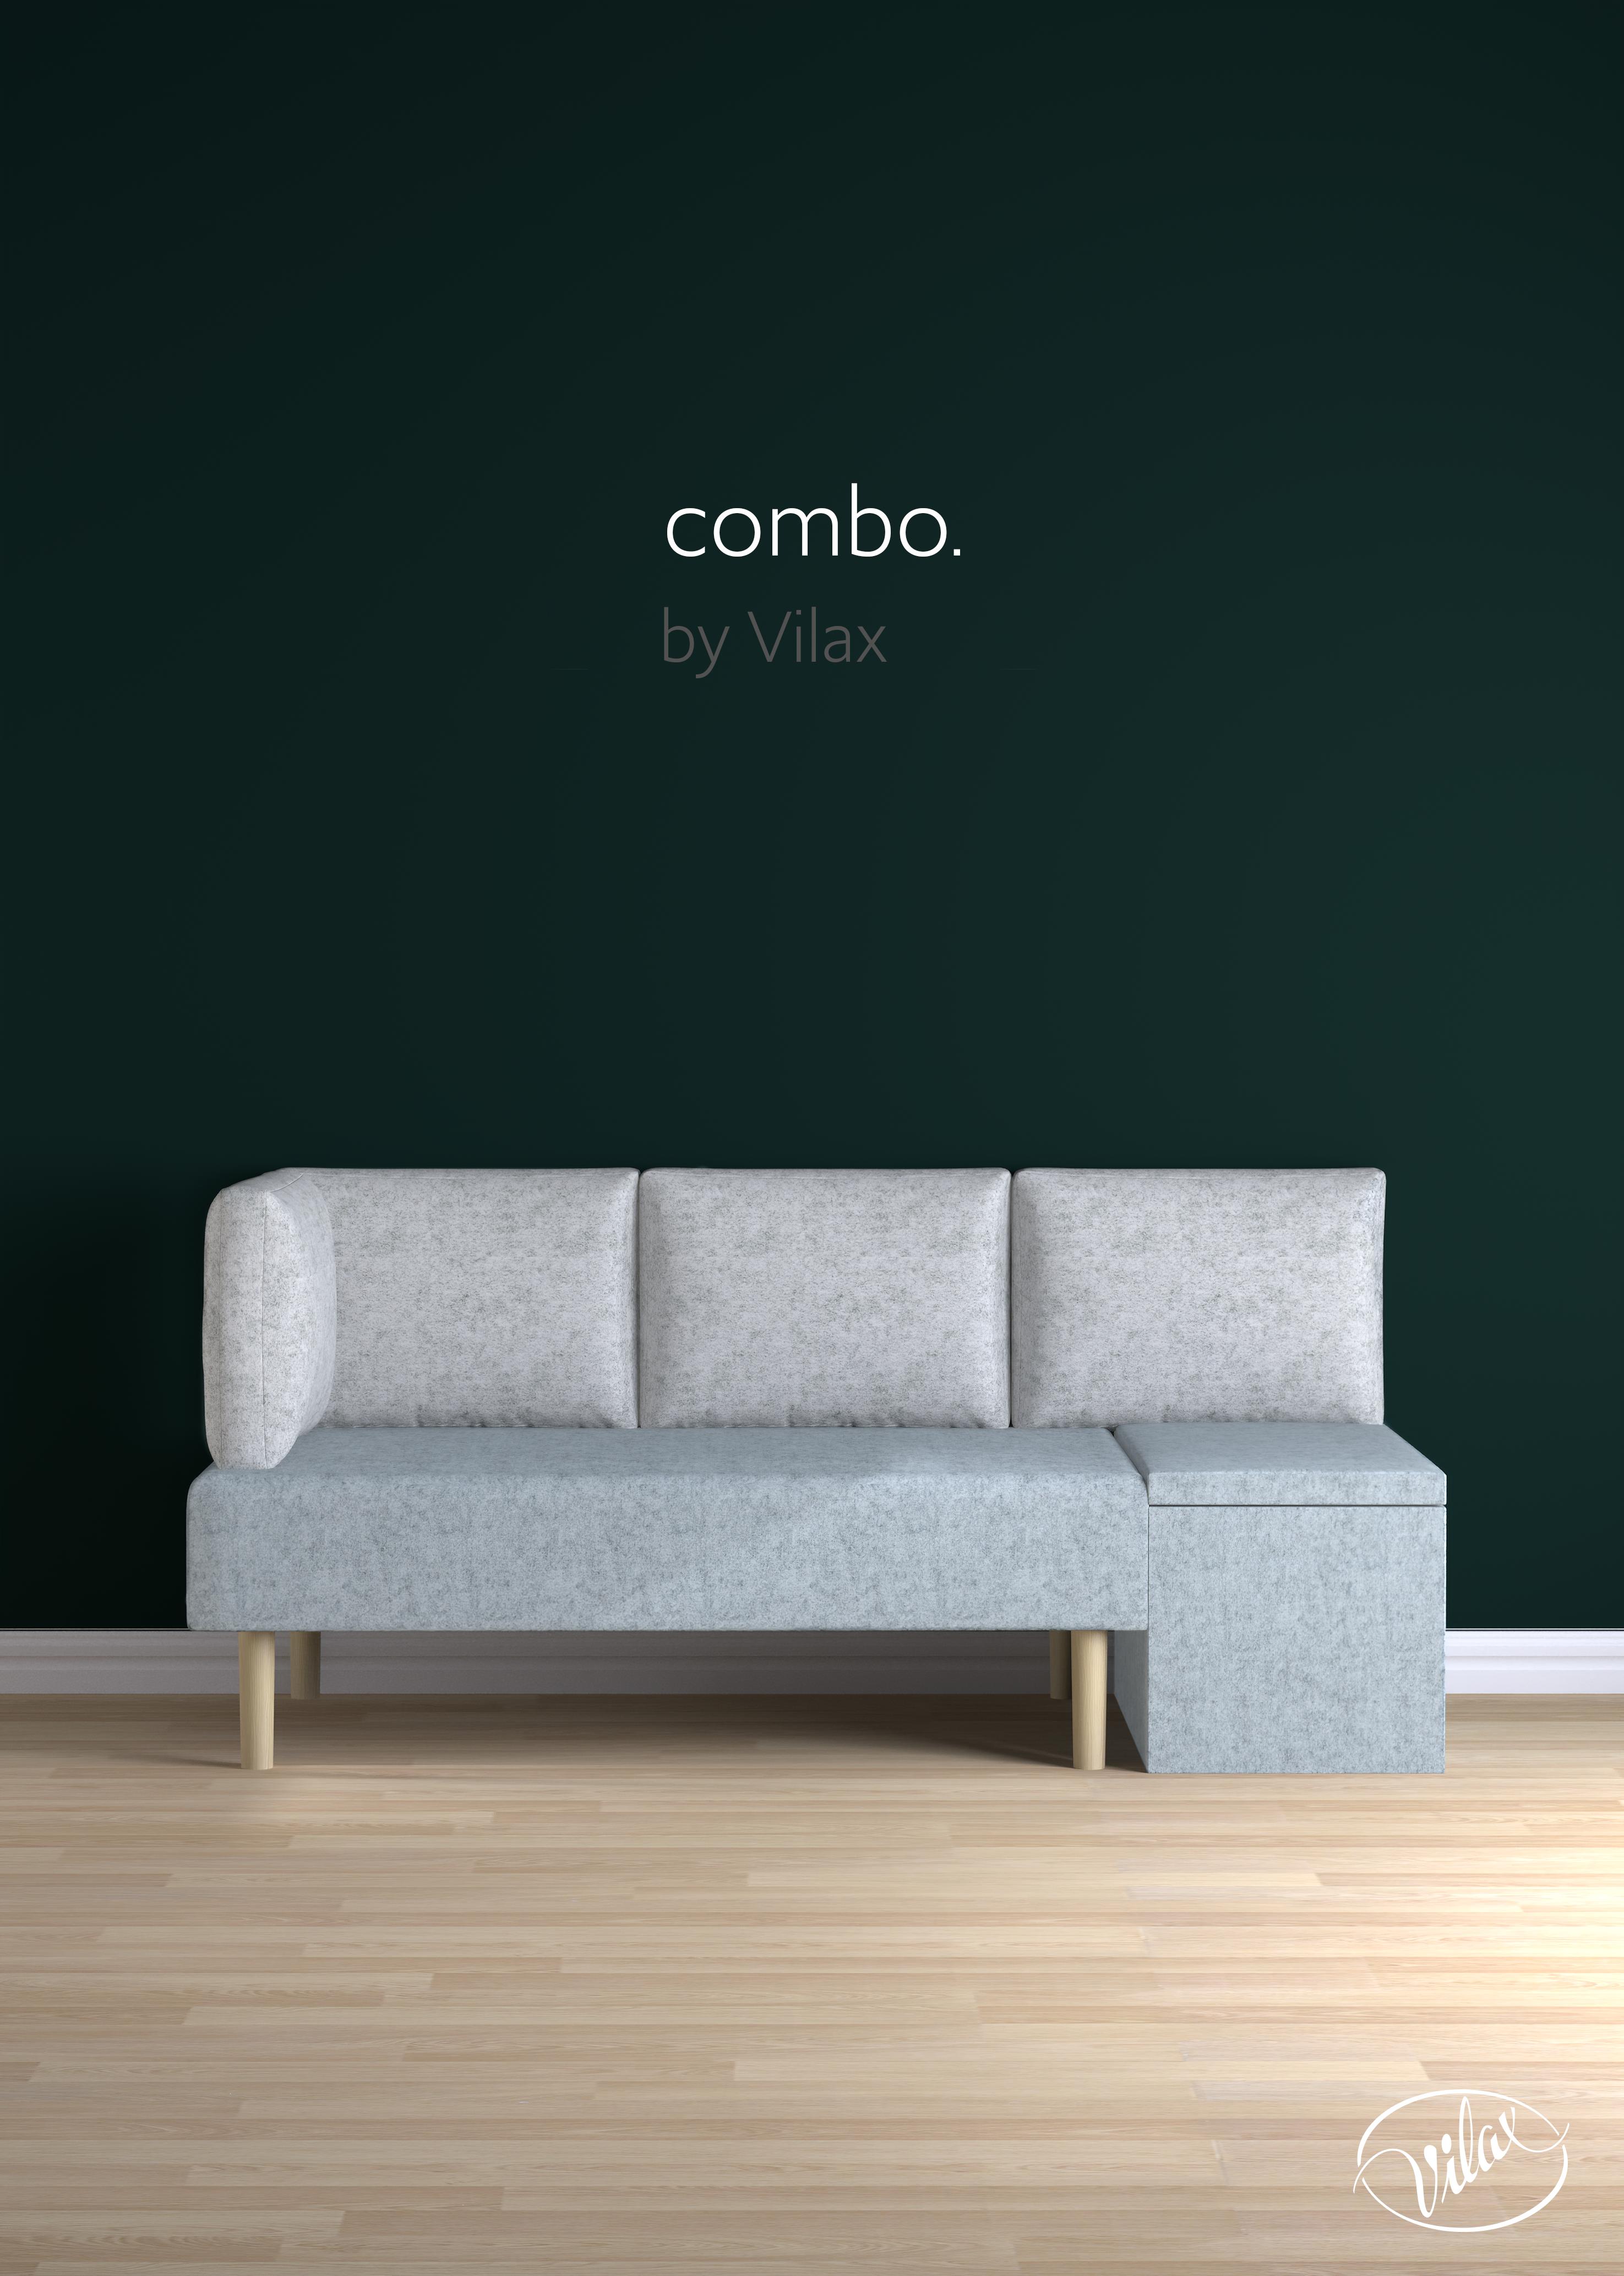 Vilax Combo